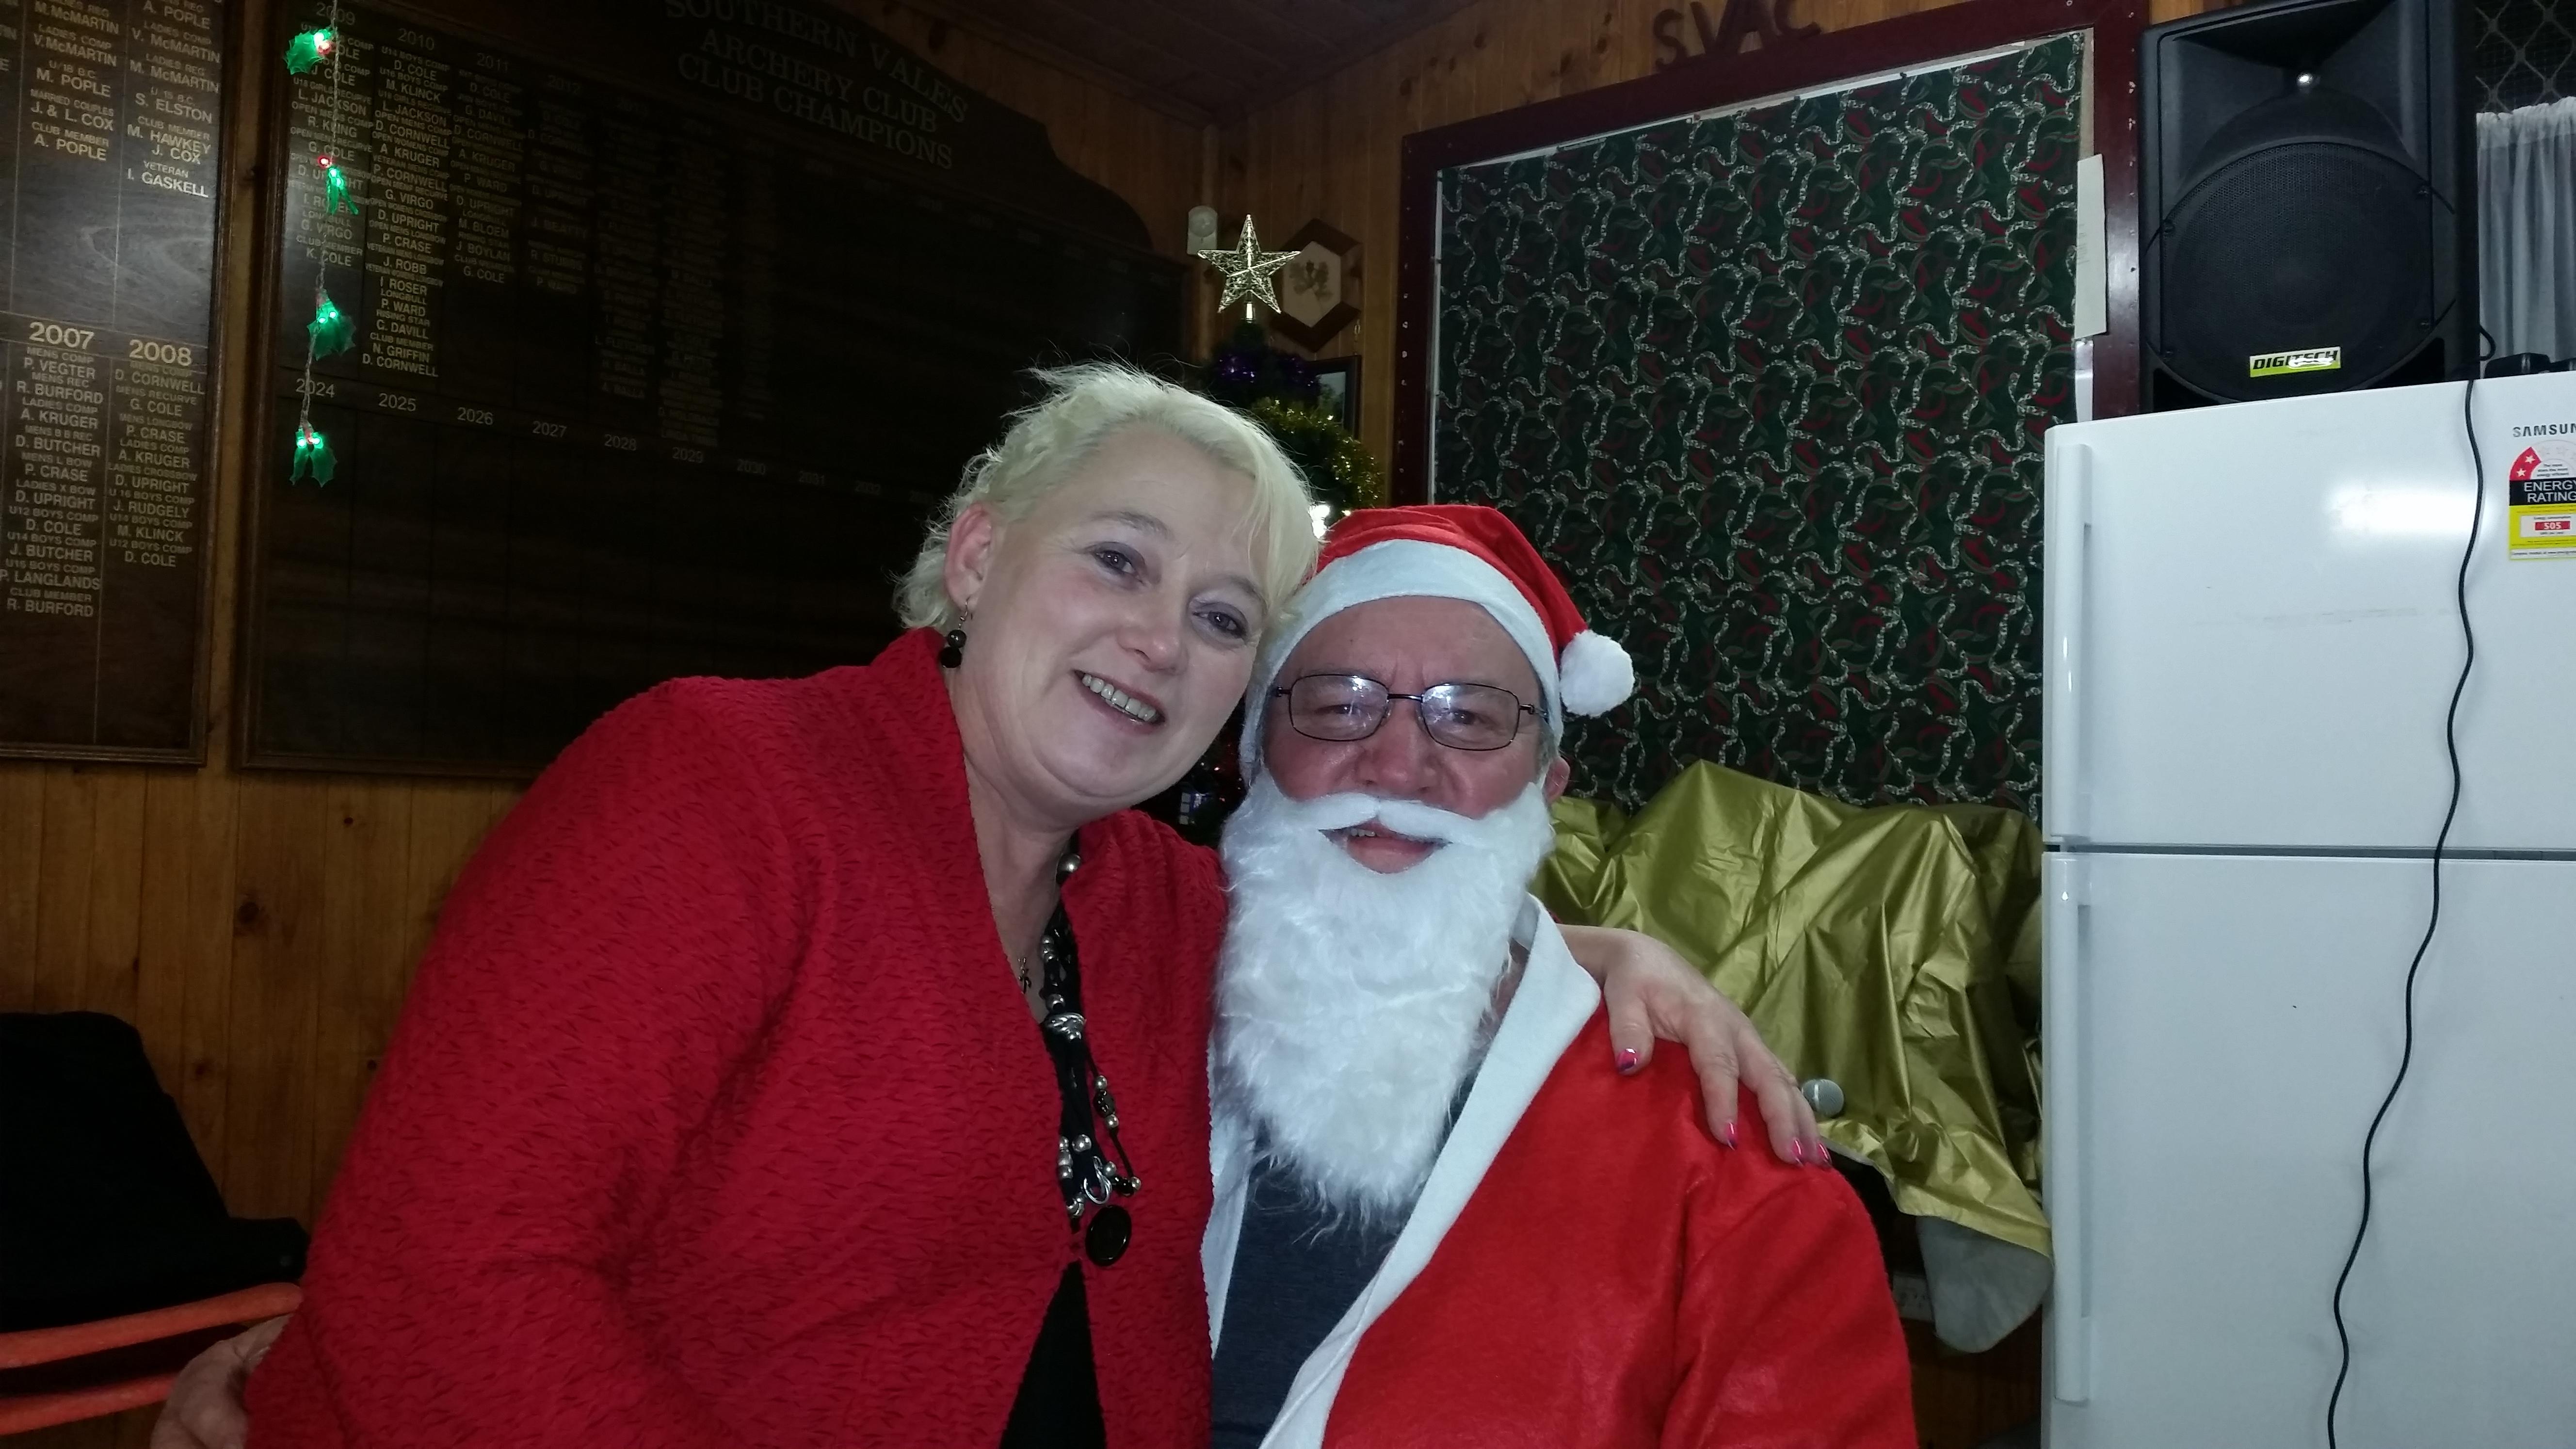 Kym and Santa